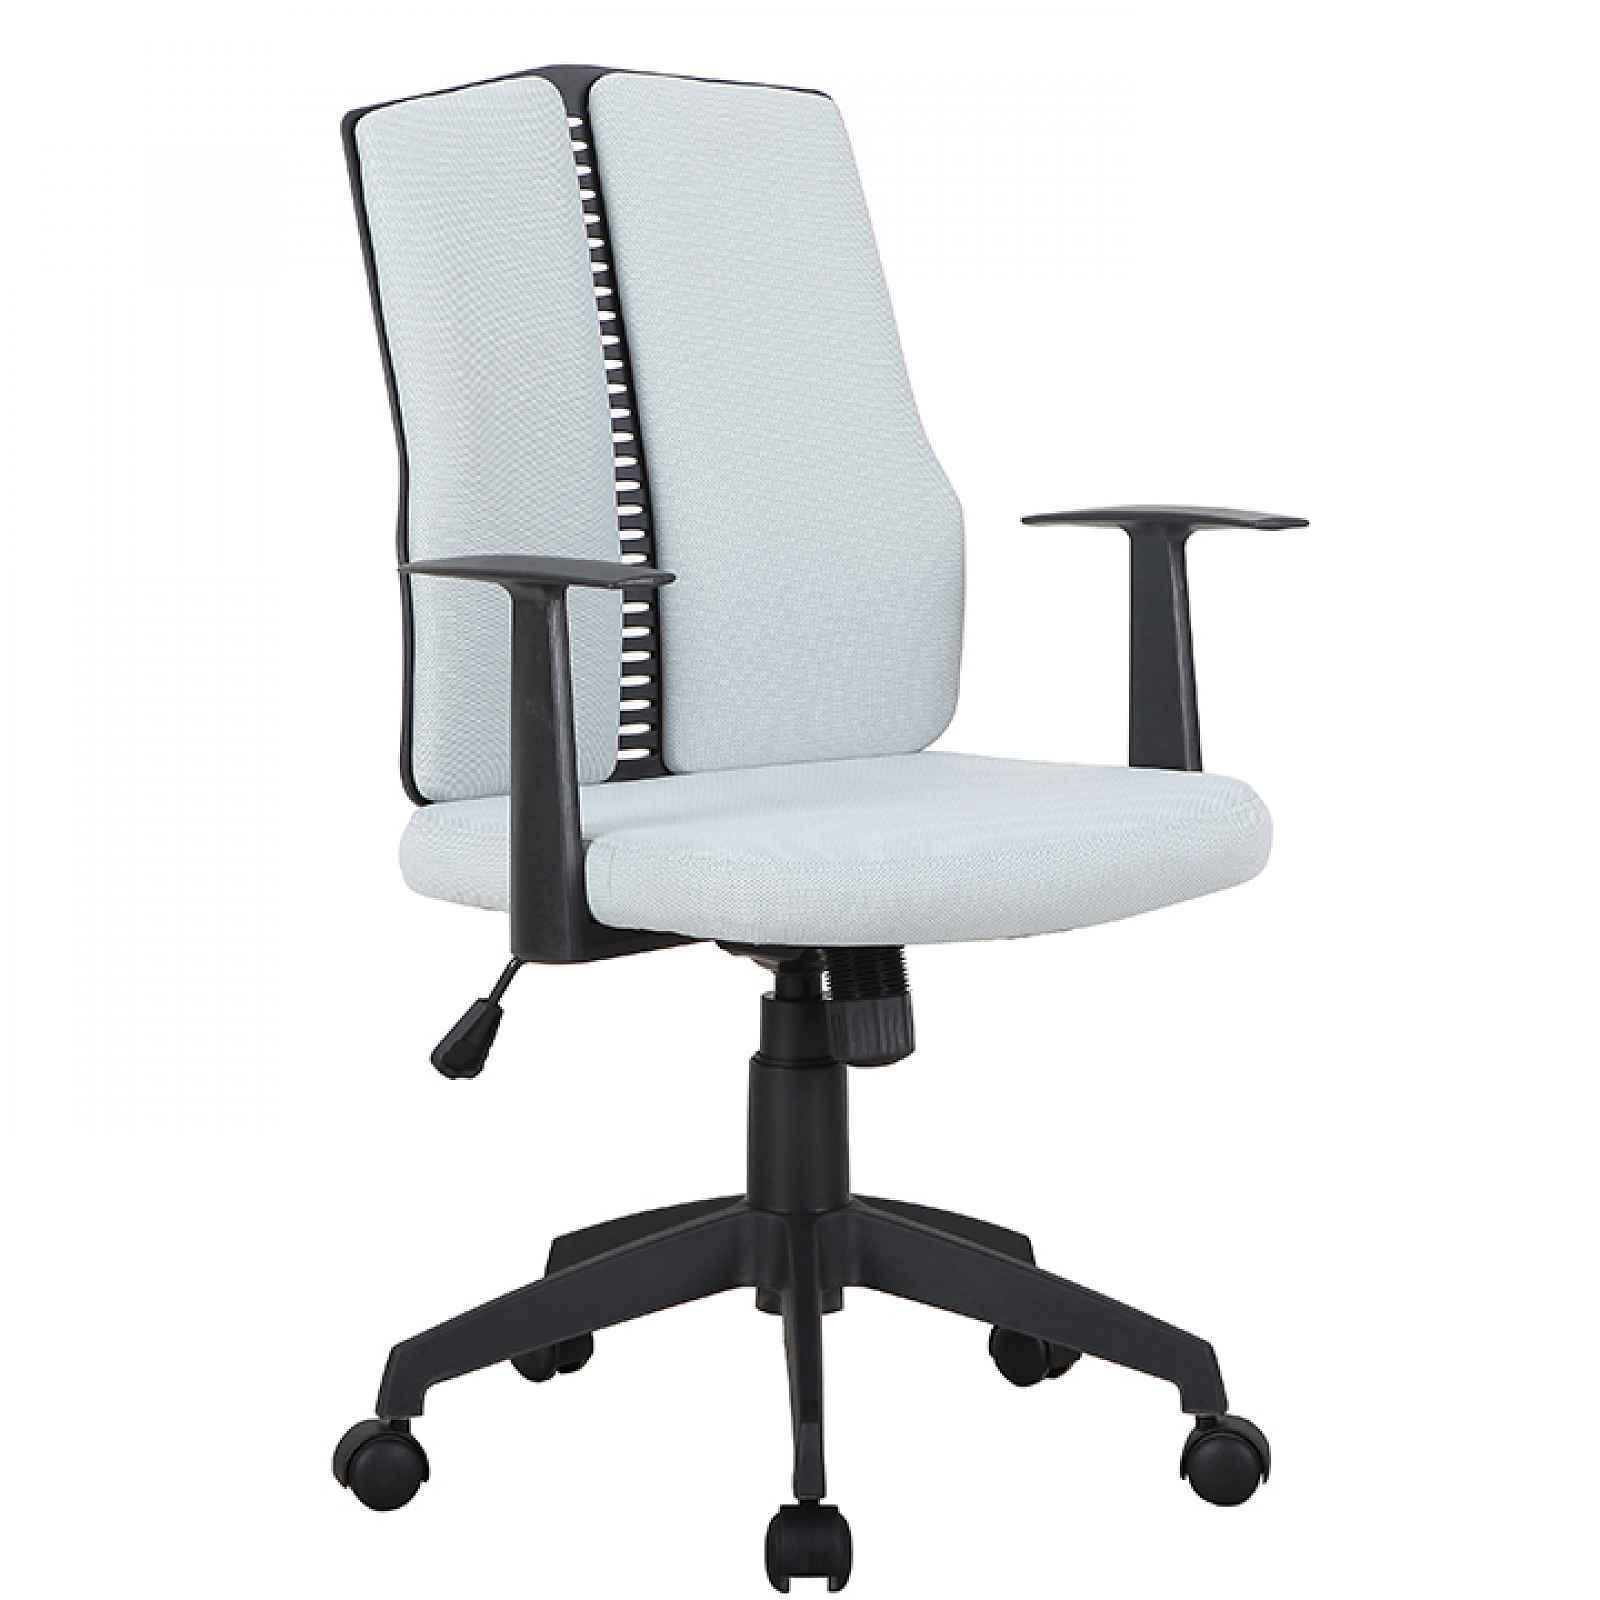 Kancelářská židle DELANO šedá / černá Tempo Kondela